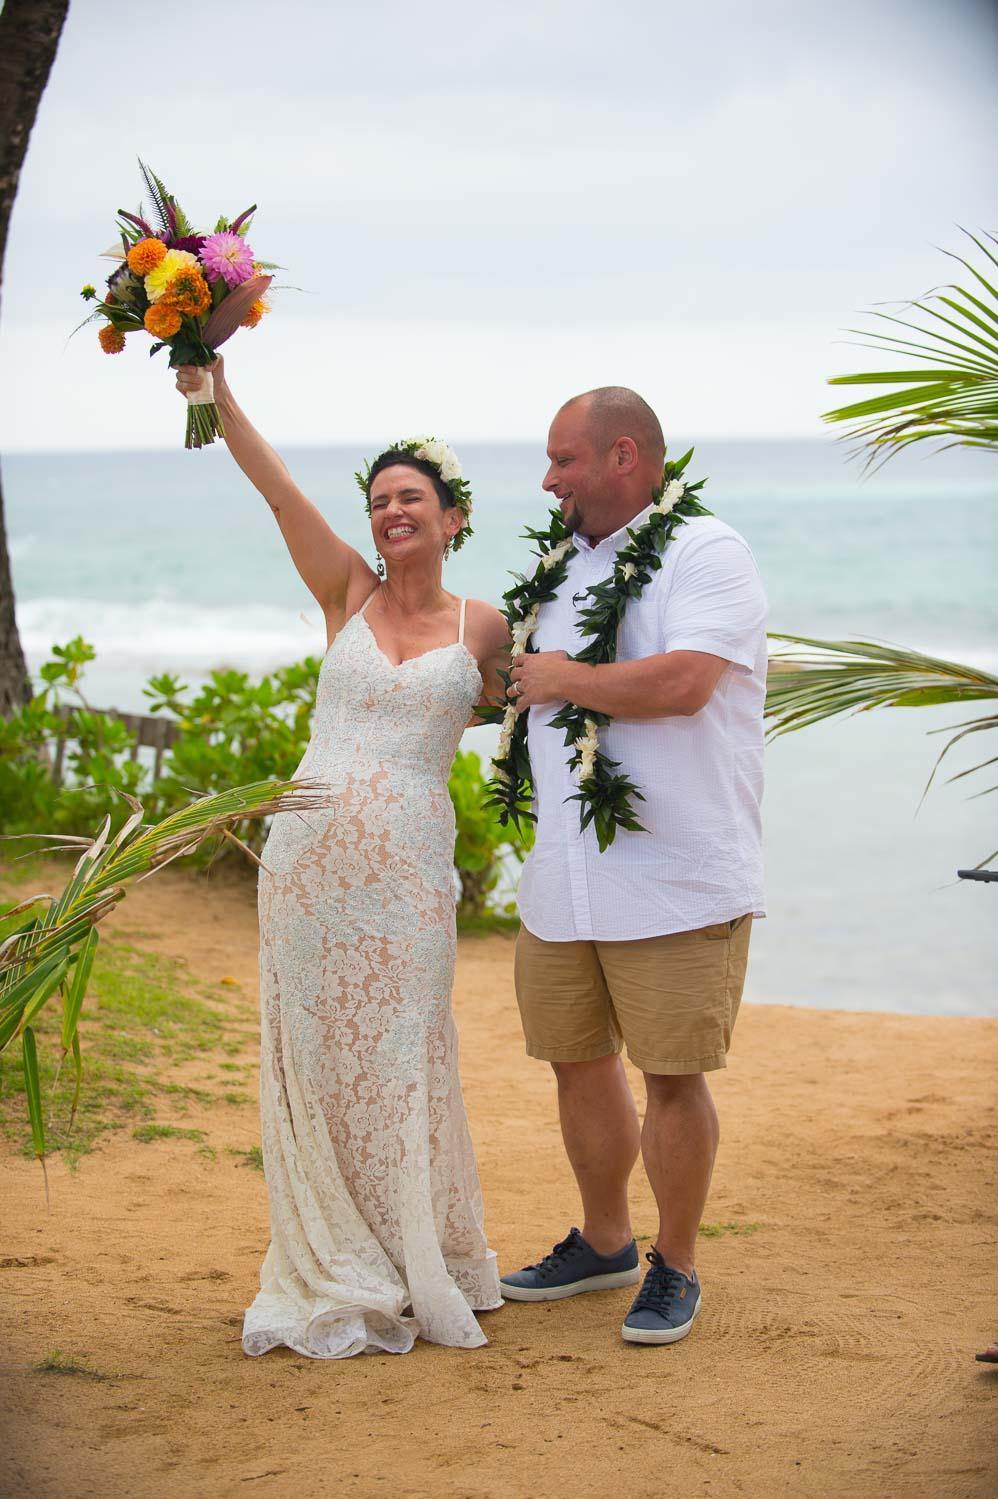 maui-wedding-photography-maui-wedding-venue-Tad-Craig-Photography-20.jpg